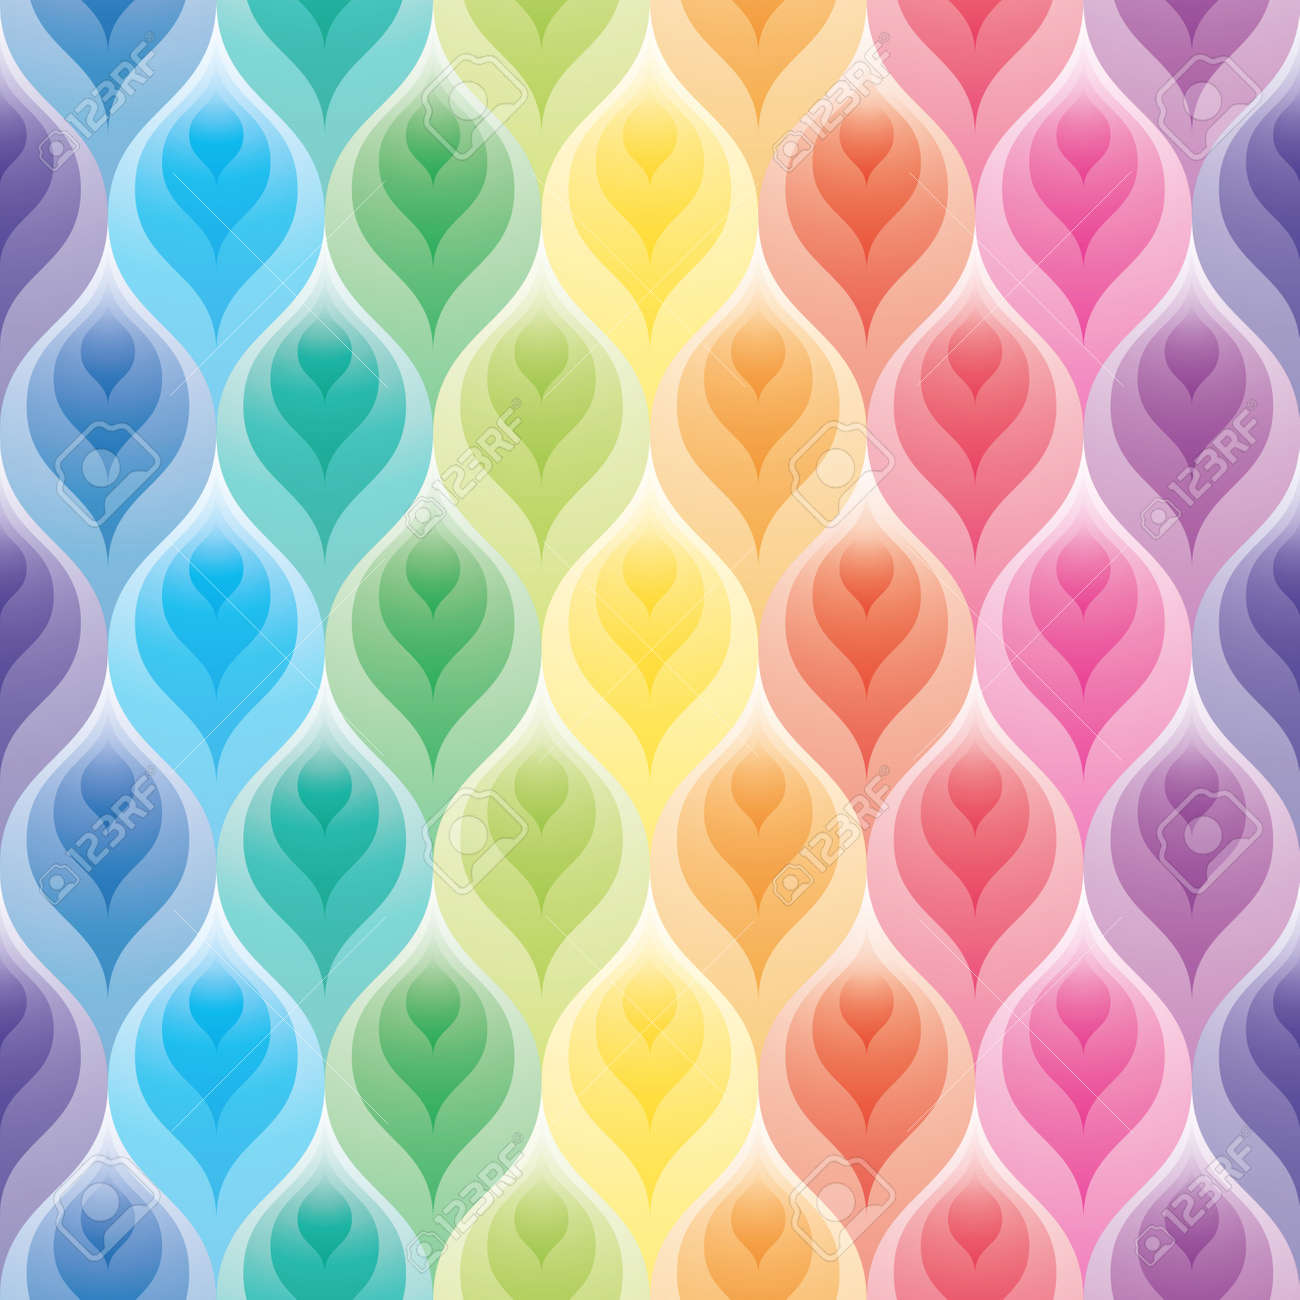 Rainbow Wallpaper 3d Seamless Background Vector EPS10 Stock